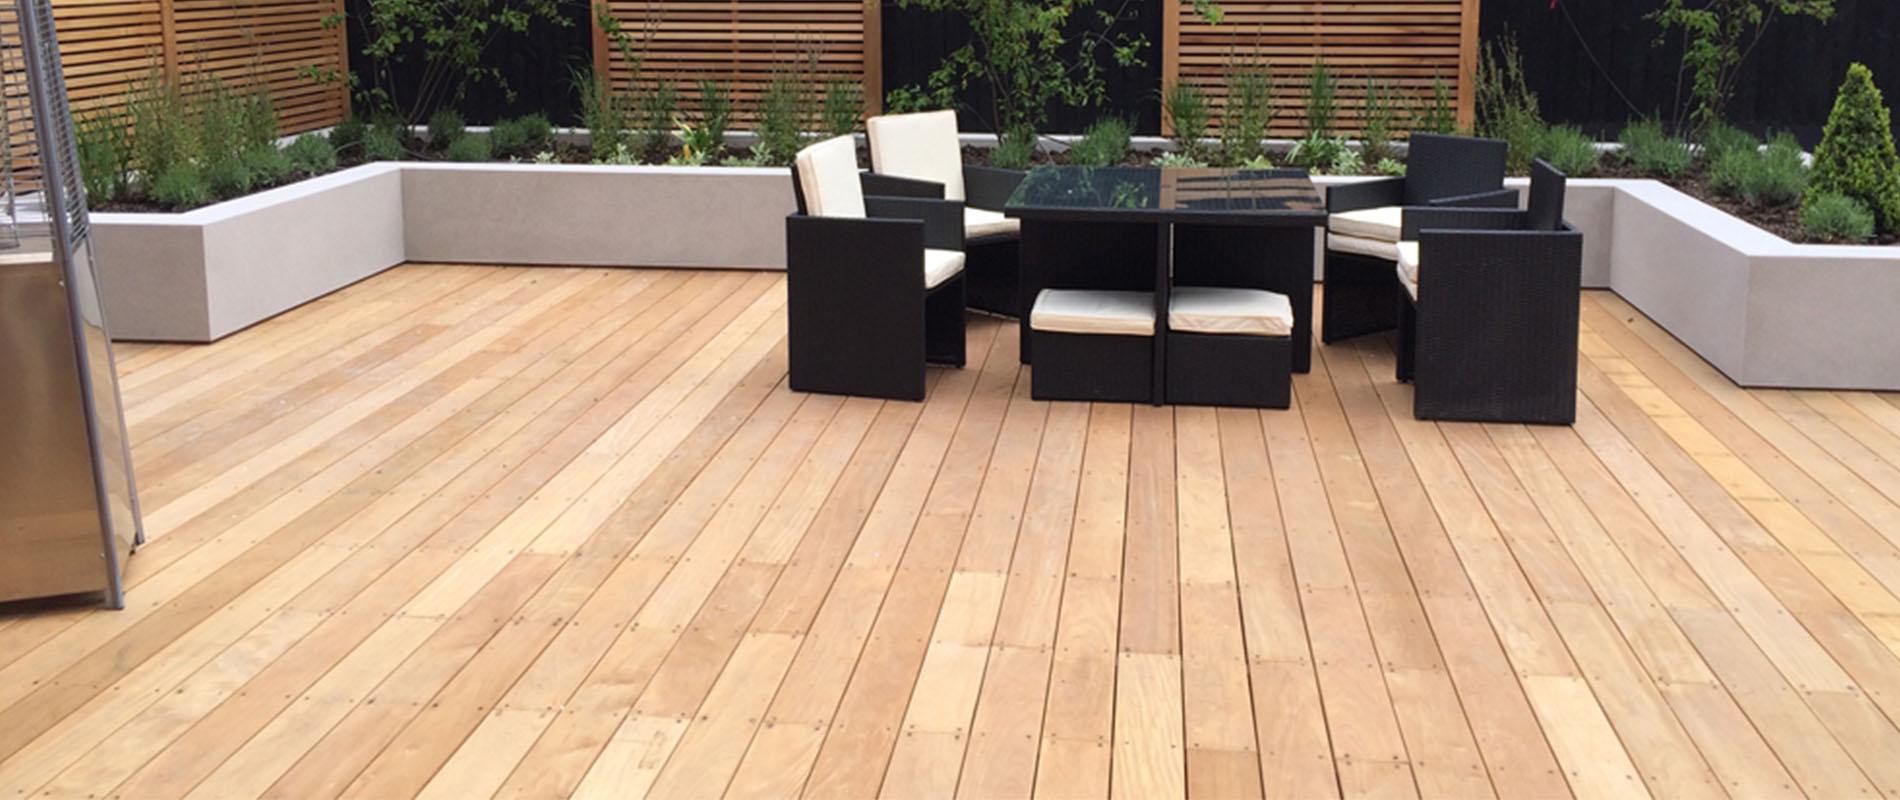 Garapa Decking and Cedar Screens Create a Modern Family Garden